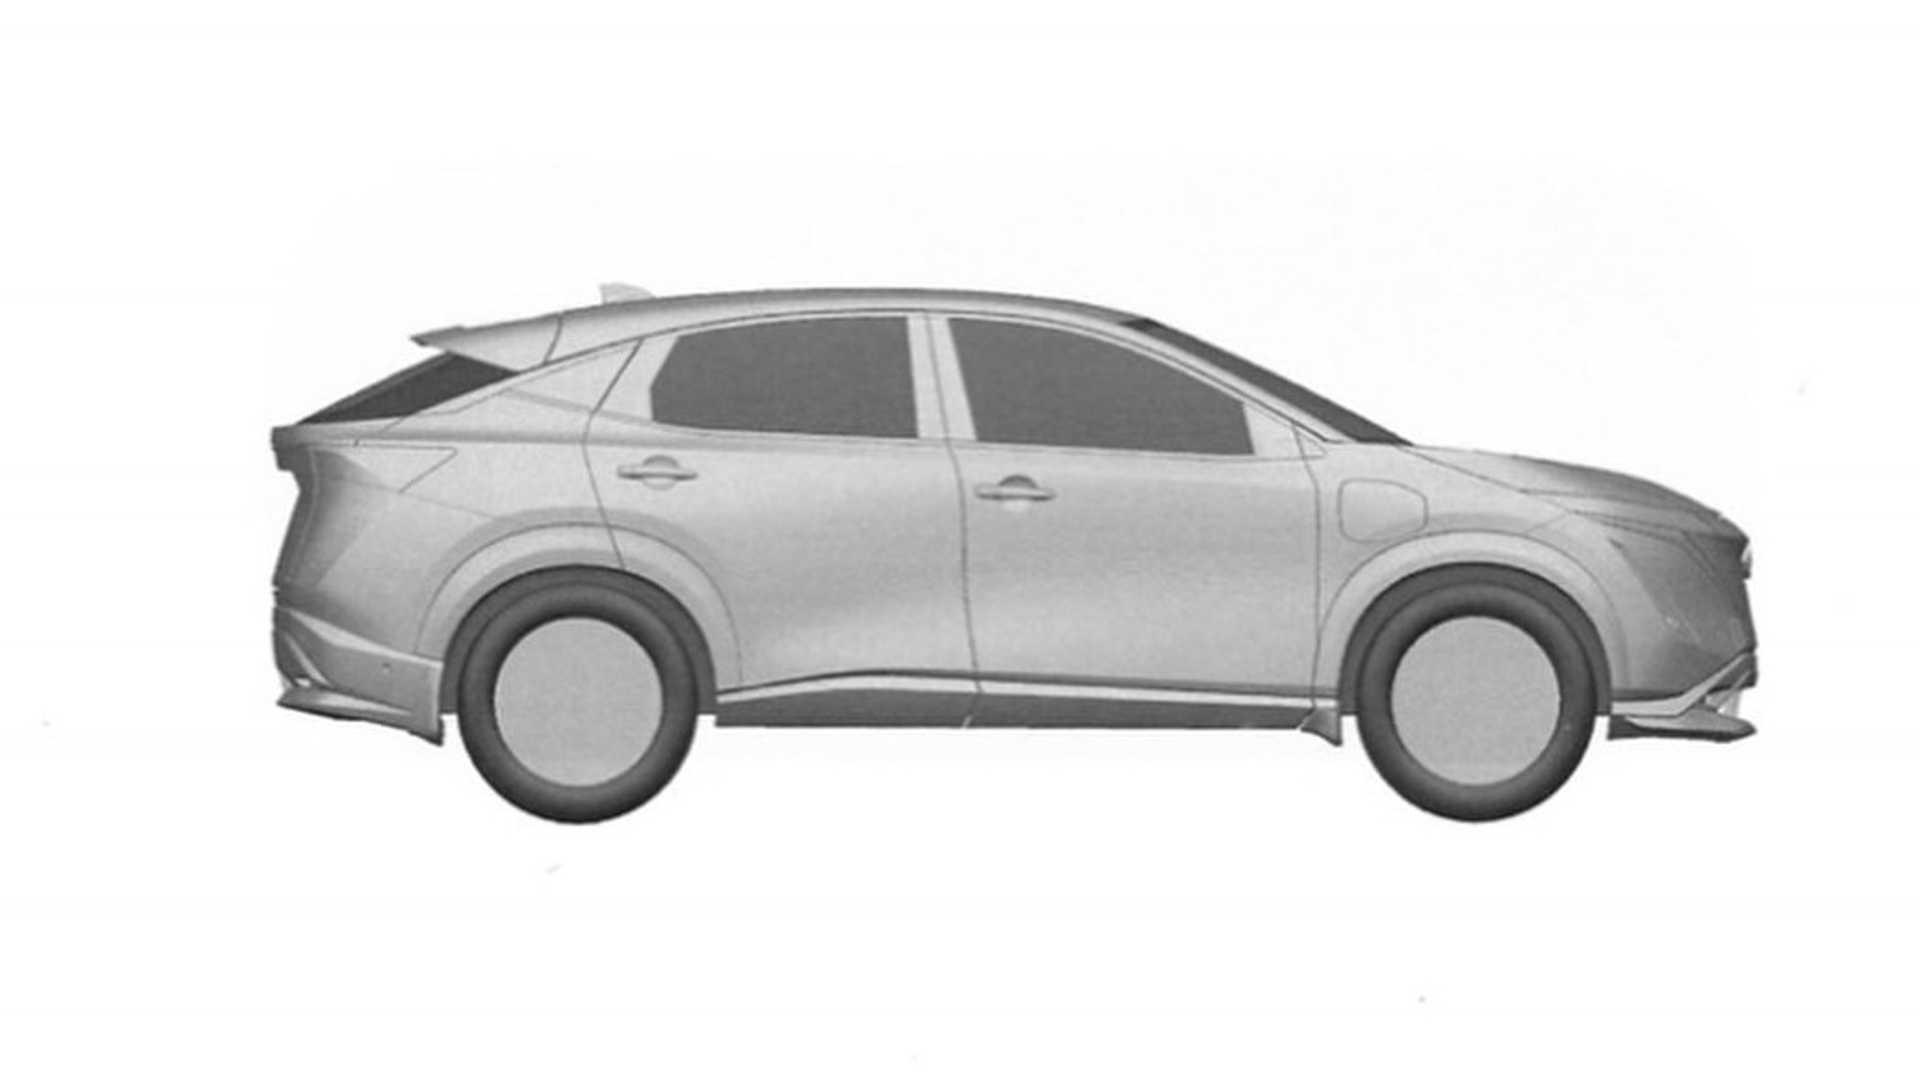 Nissan_Ariya_sketch_patent_0002